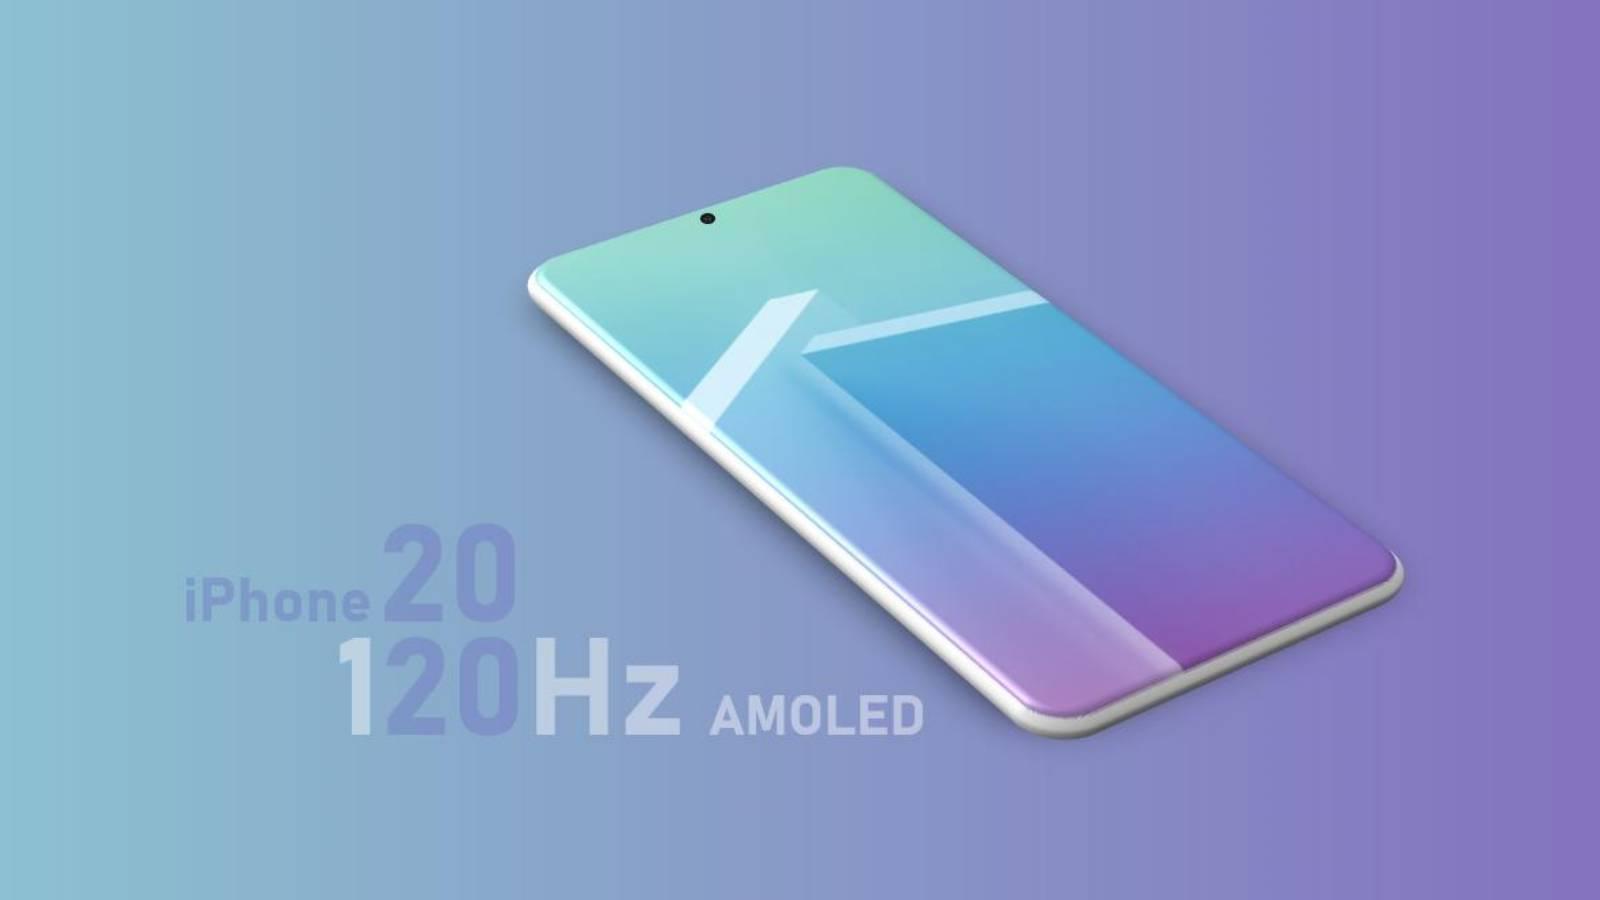 iPhone 12 Pro 120 hz